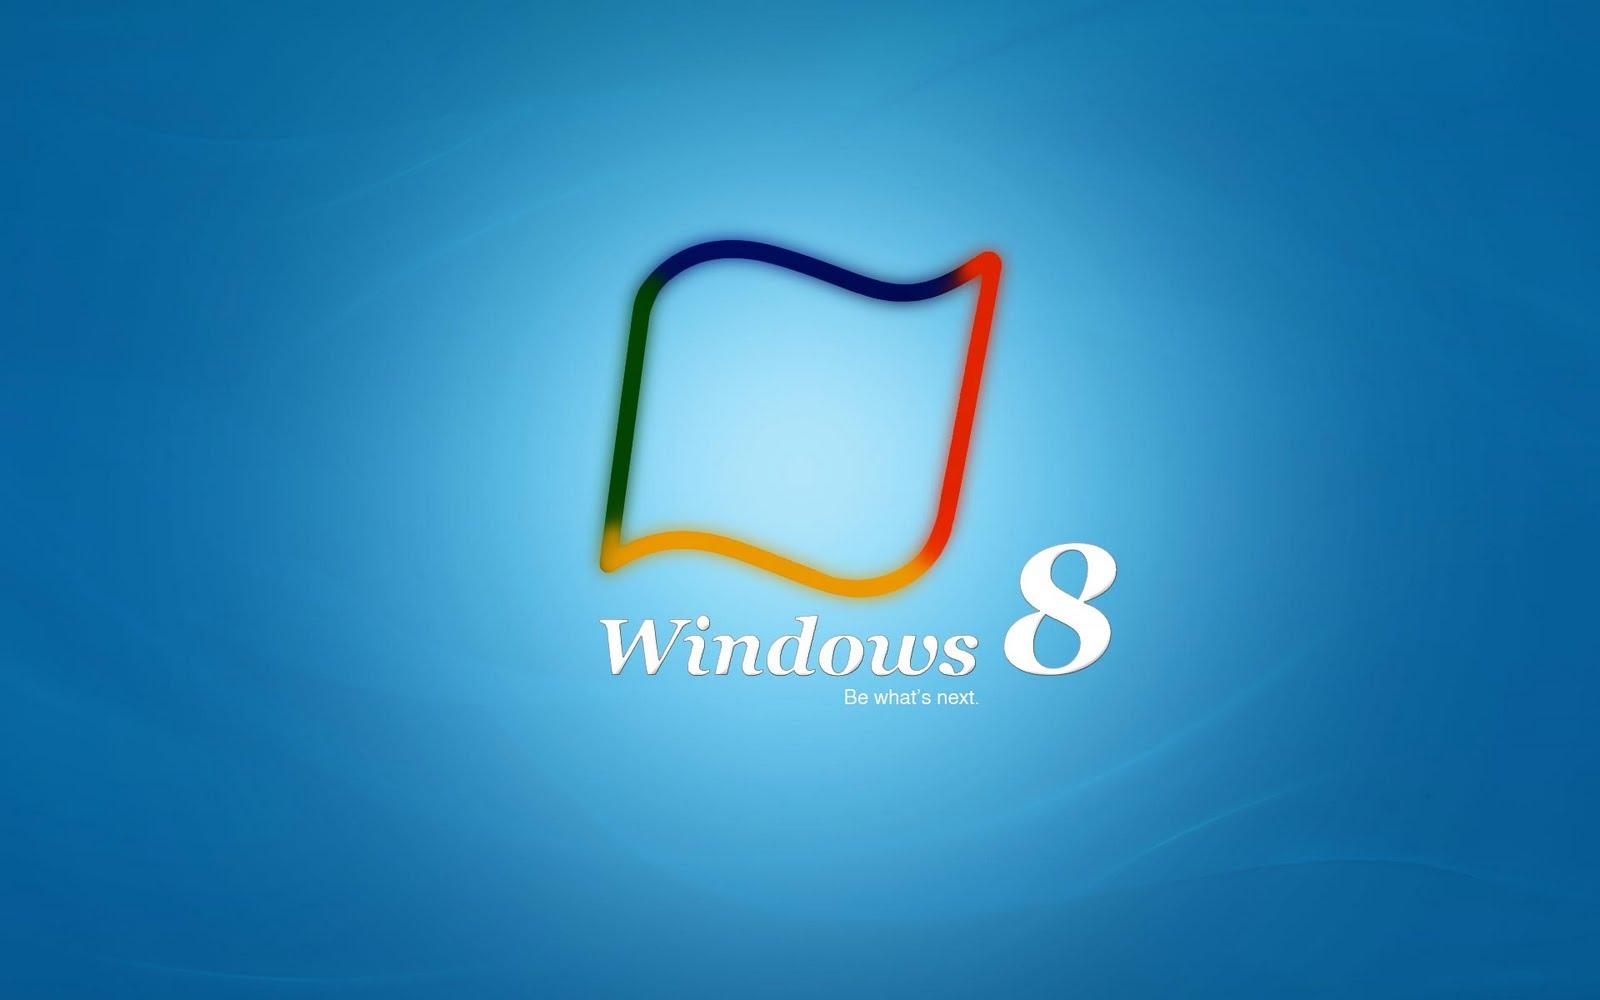 http://1.bp.blogspot.com/-NP6sNkwmAyI/UJPIAGLWT_I/AAAAAAAABJM/wmyNnGkeIu0/s1600/Windows%2B8%2Bhd%2Bwidescreen%2Bwallpapers_1920x1200.jpeg